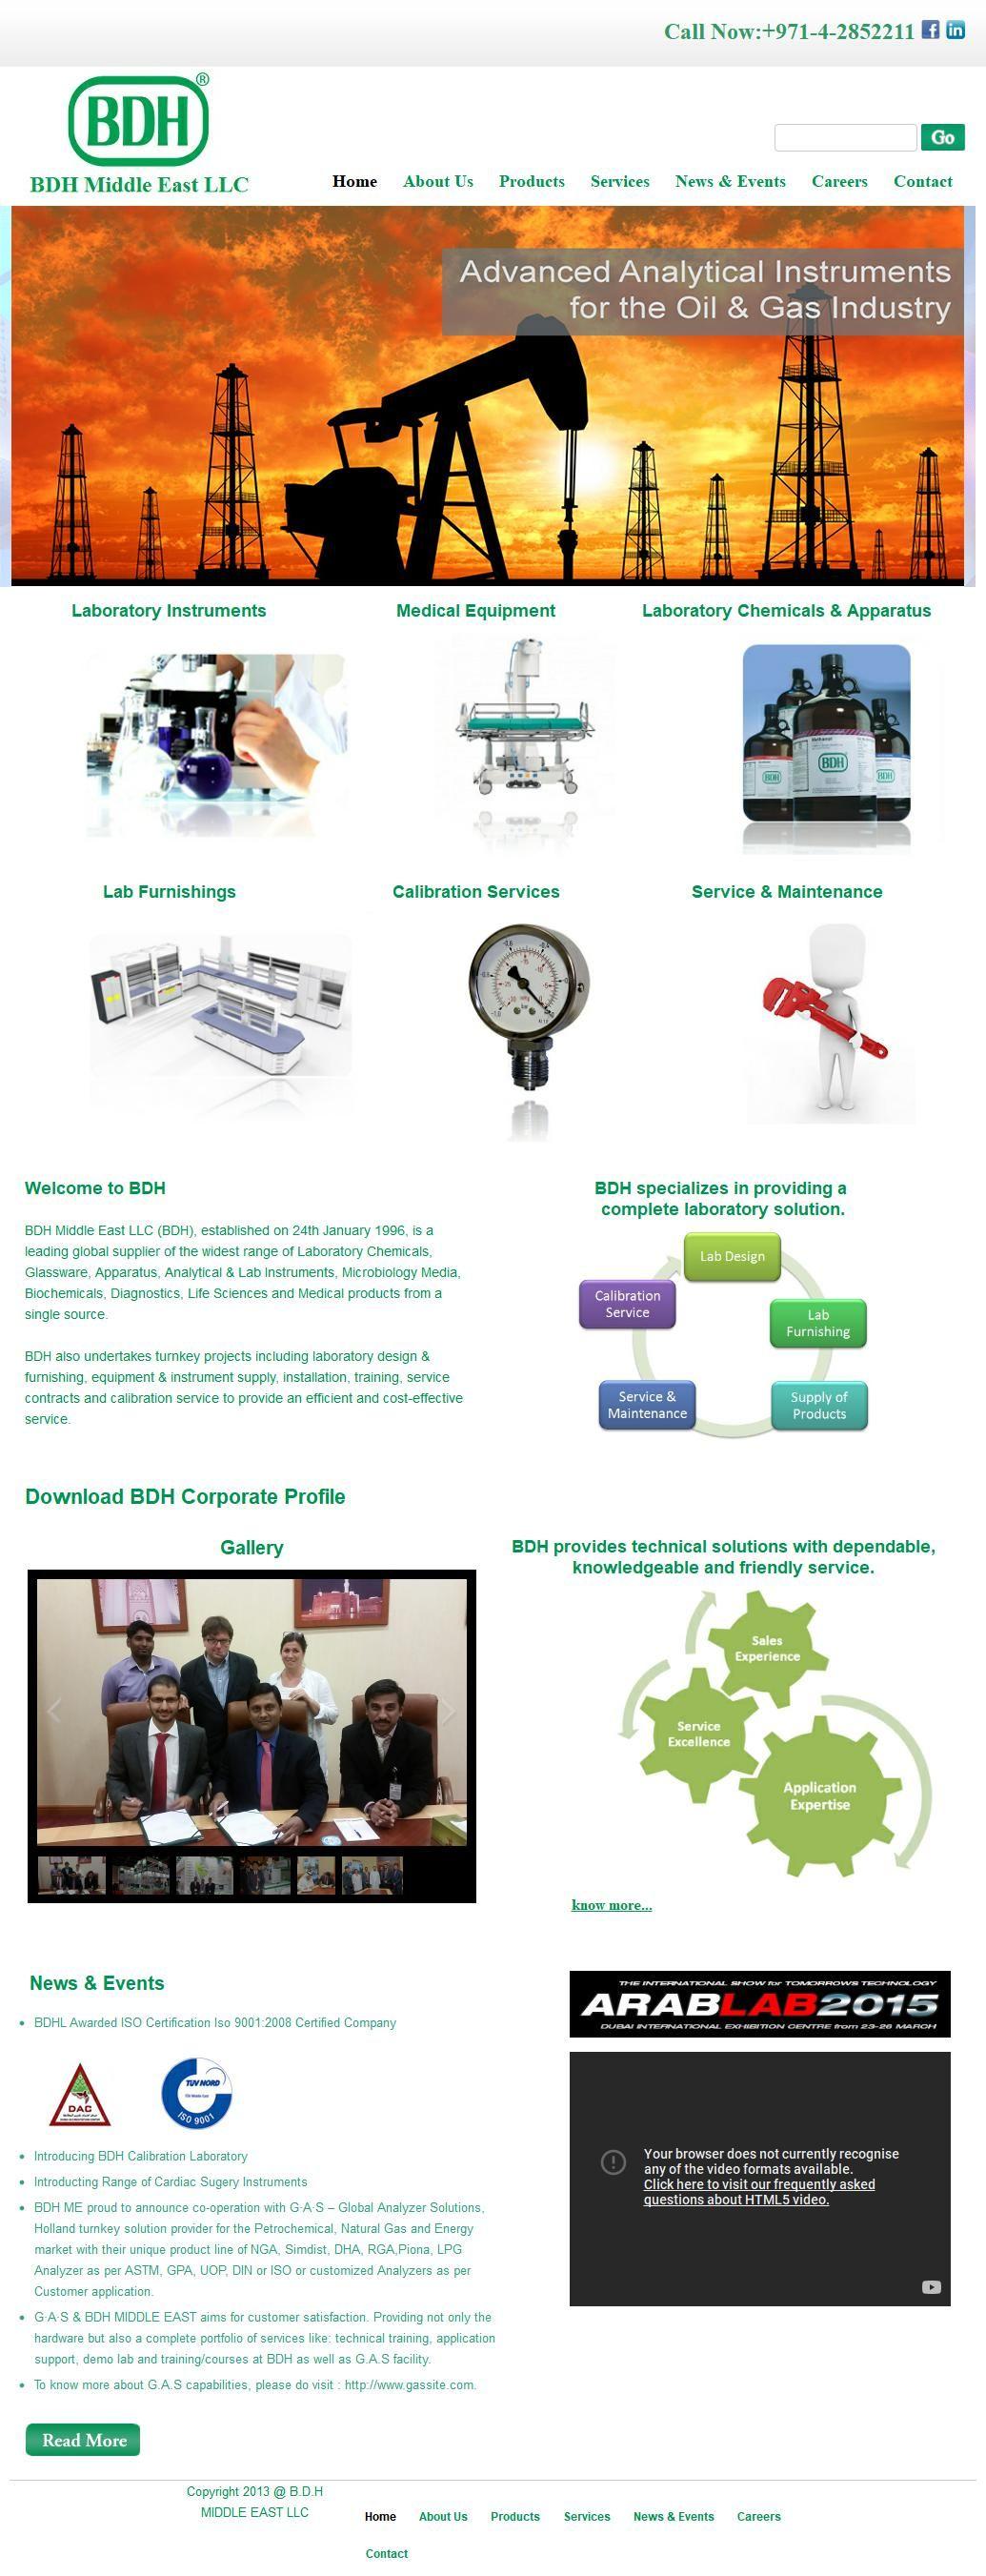 Bdh Laboratories Calibration Division Company Hafele Group